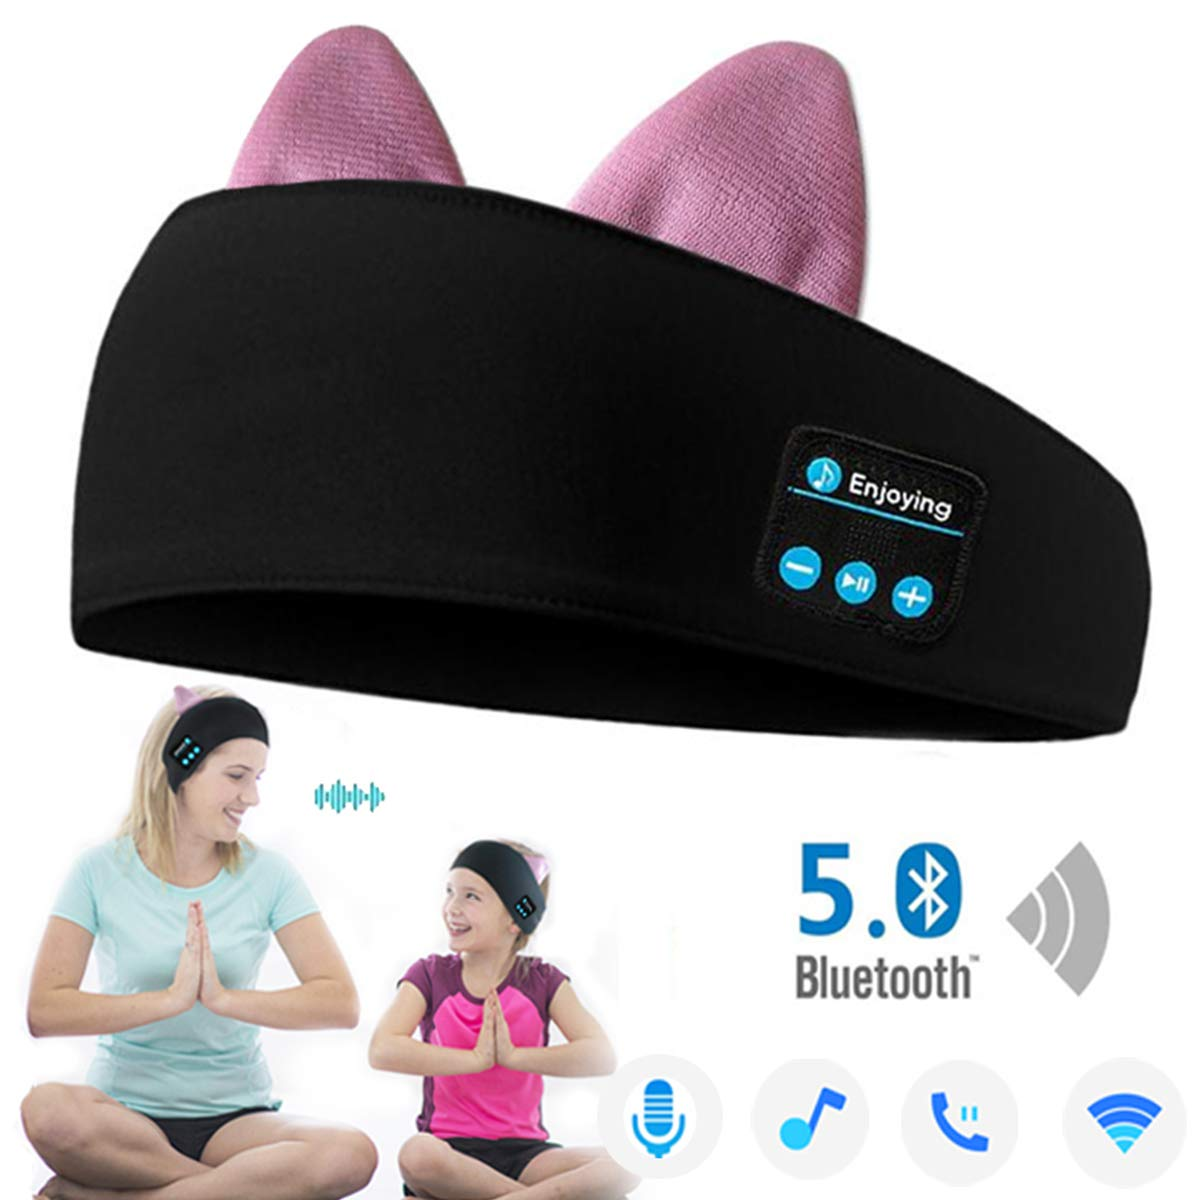 Bluetooth 5.0 Cat Headband Headphones, Wireless Sports Headband Headphones with Cat Ears Perfect for Workout,Jogging,Yoga,Insomnia, Side Sleepers, Travel, Meditation